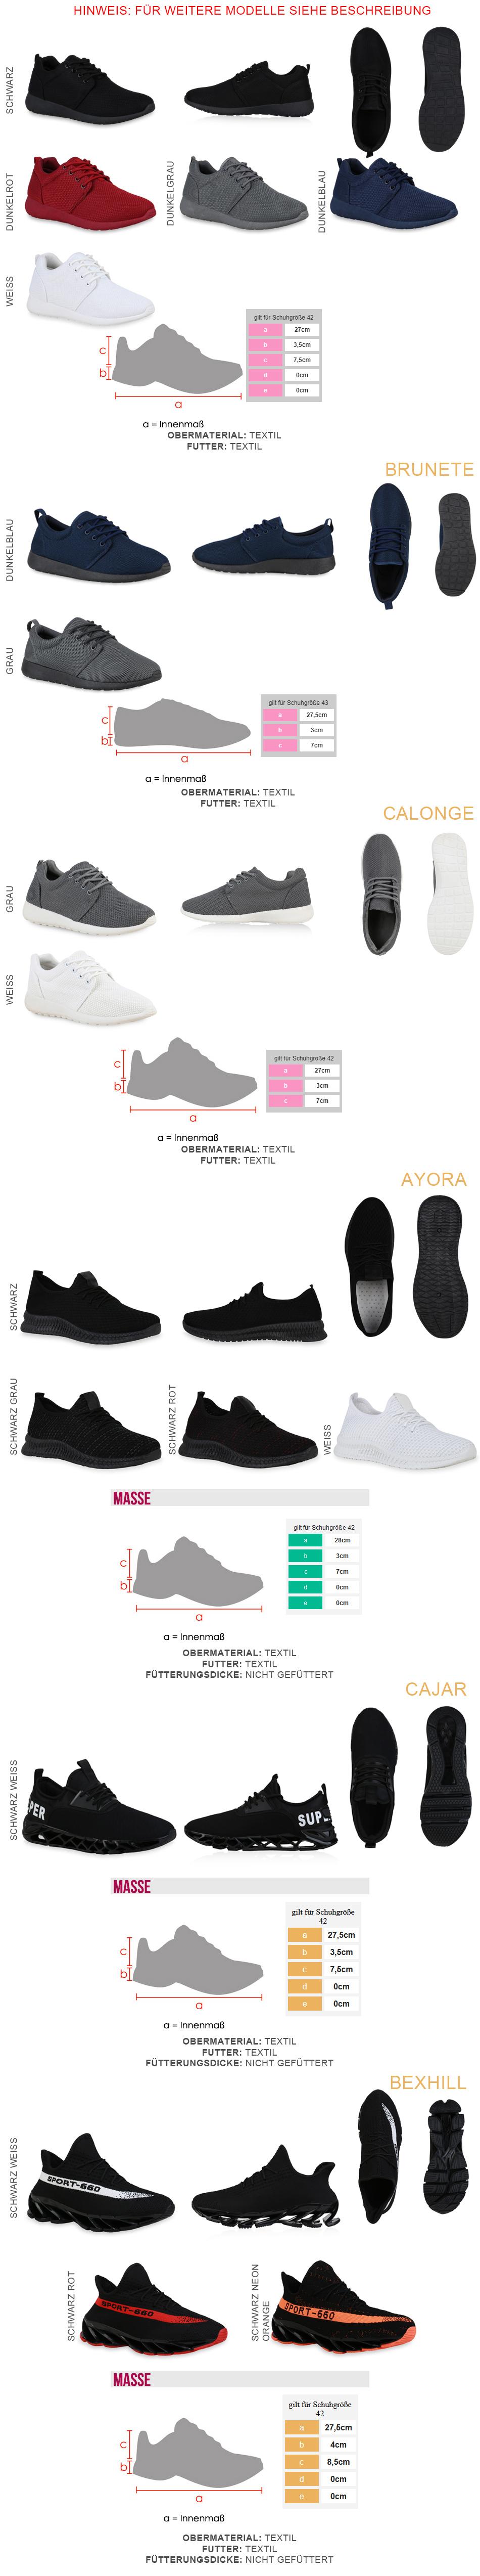 Laufschuhe Neu Sneaker Trendy Details zu Herren Sohle Fitness Sportschuhe Schuhe 822789 On0wPk8